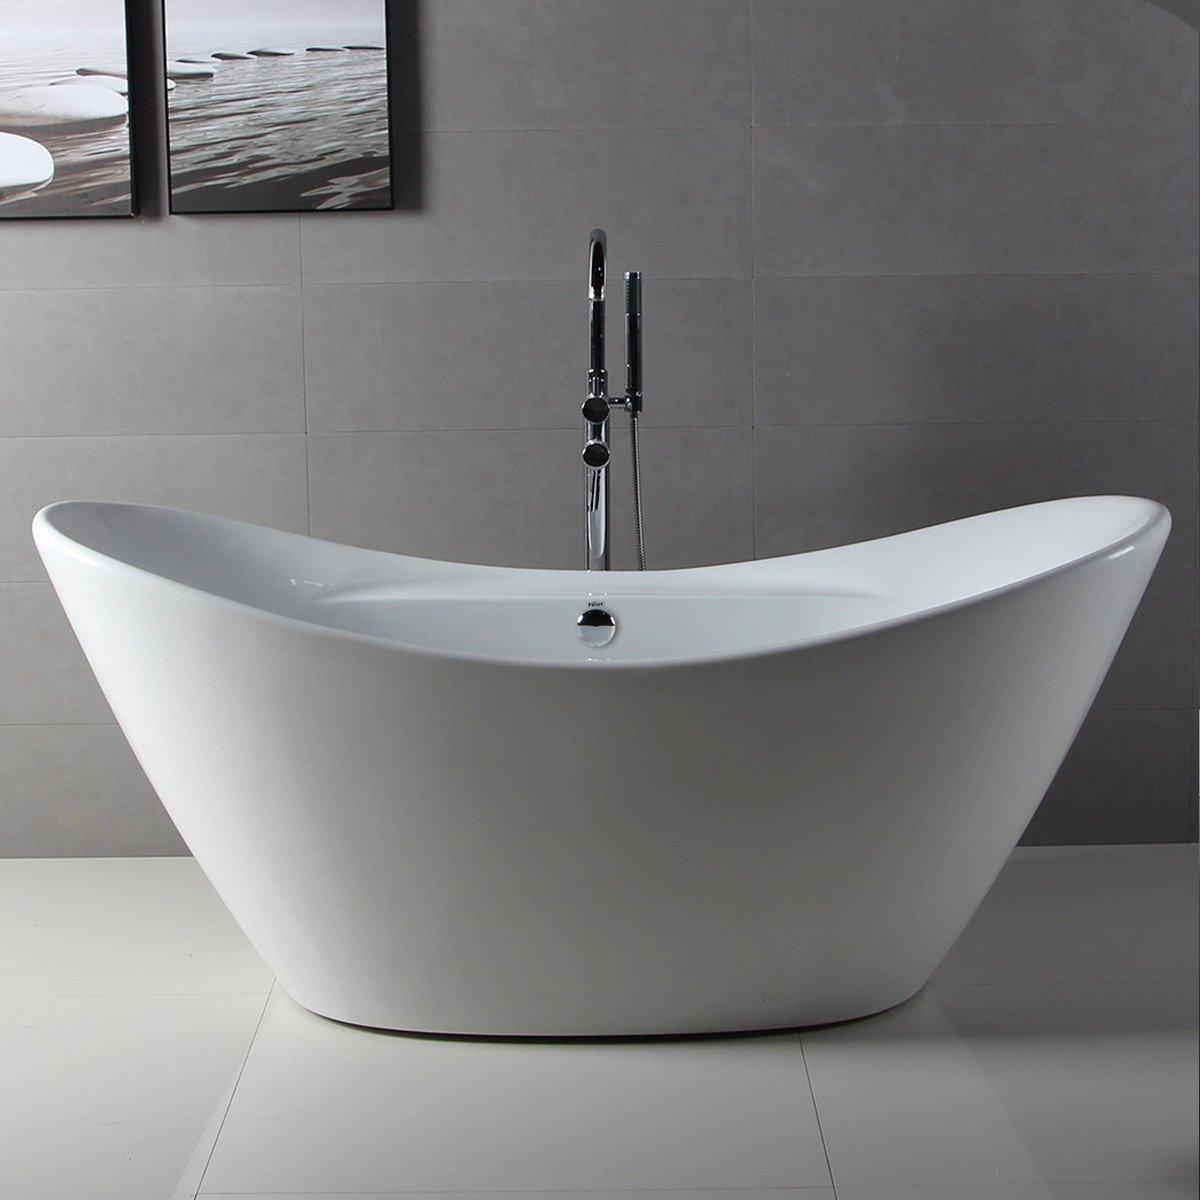 FerdY Bathroom Freestanding Acrylic Soaking Bathtub White Color (67 ...